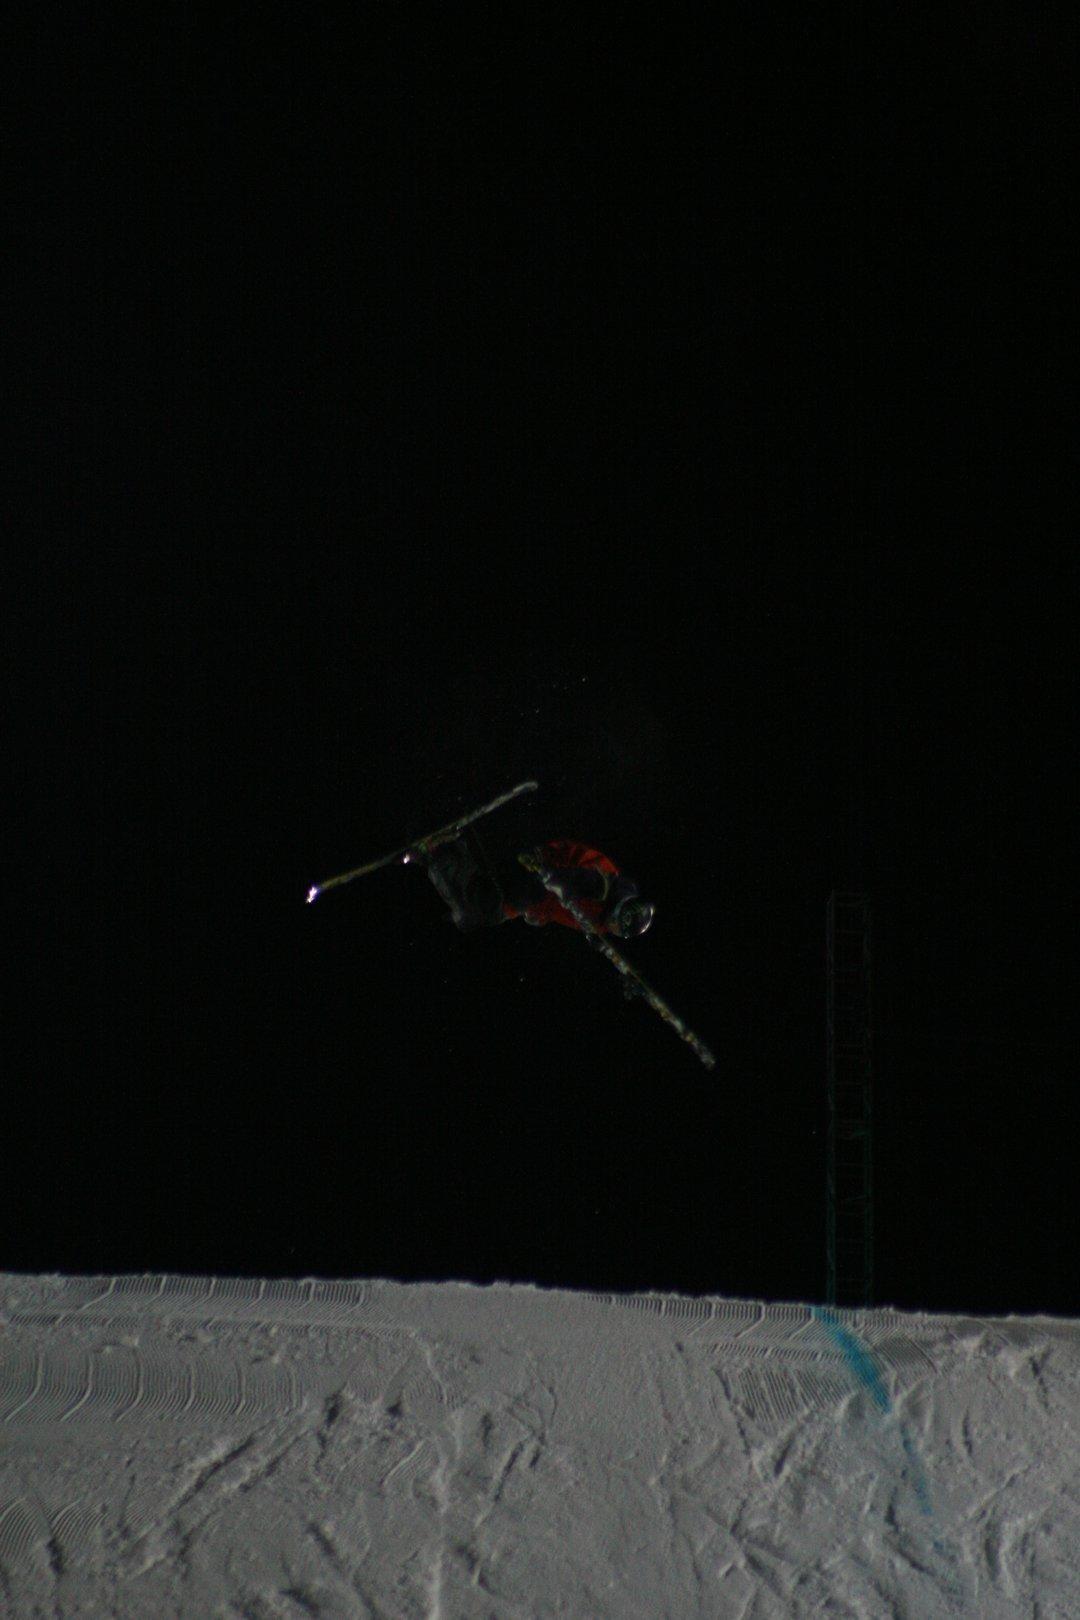 Pulling off ski mid-air.